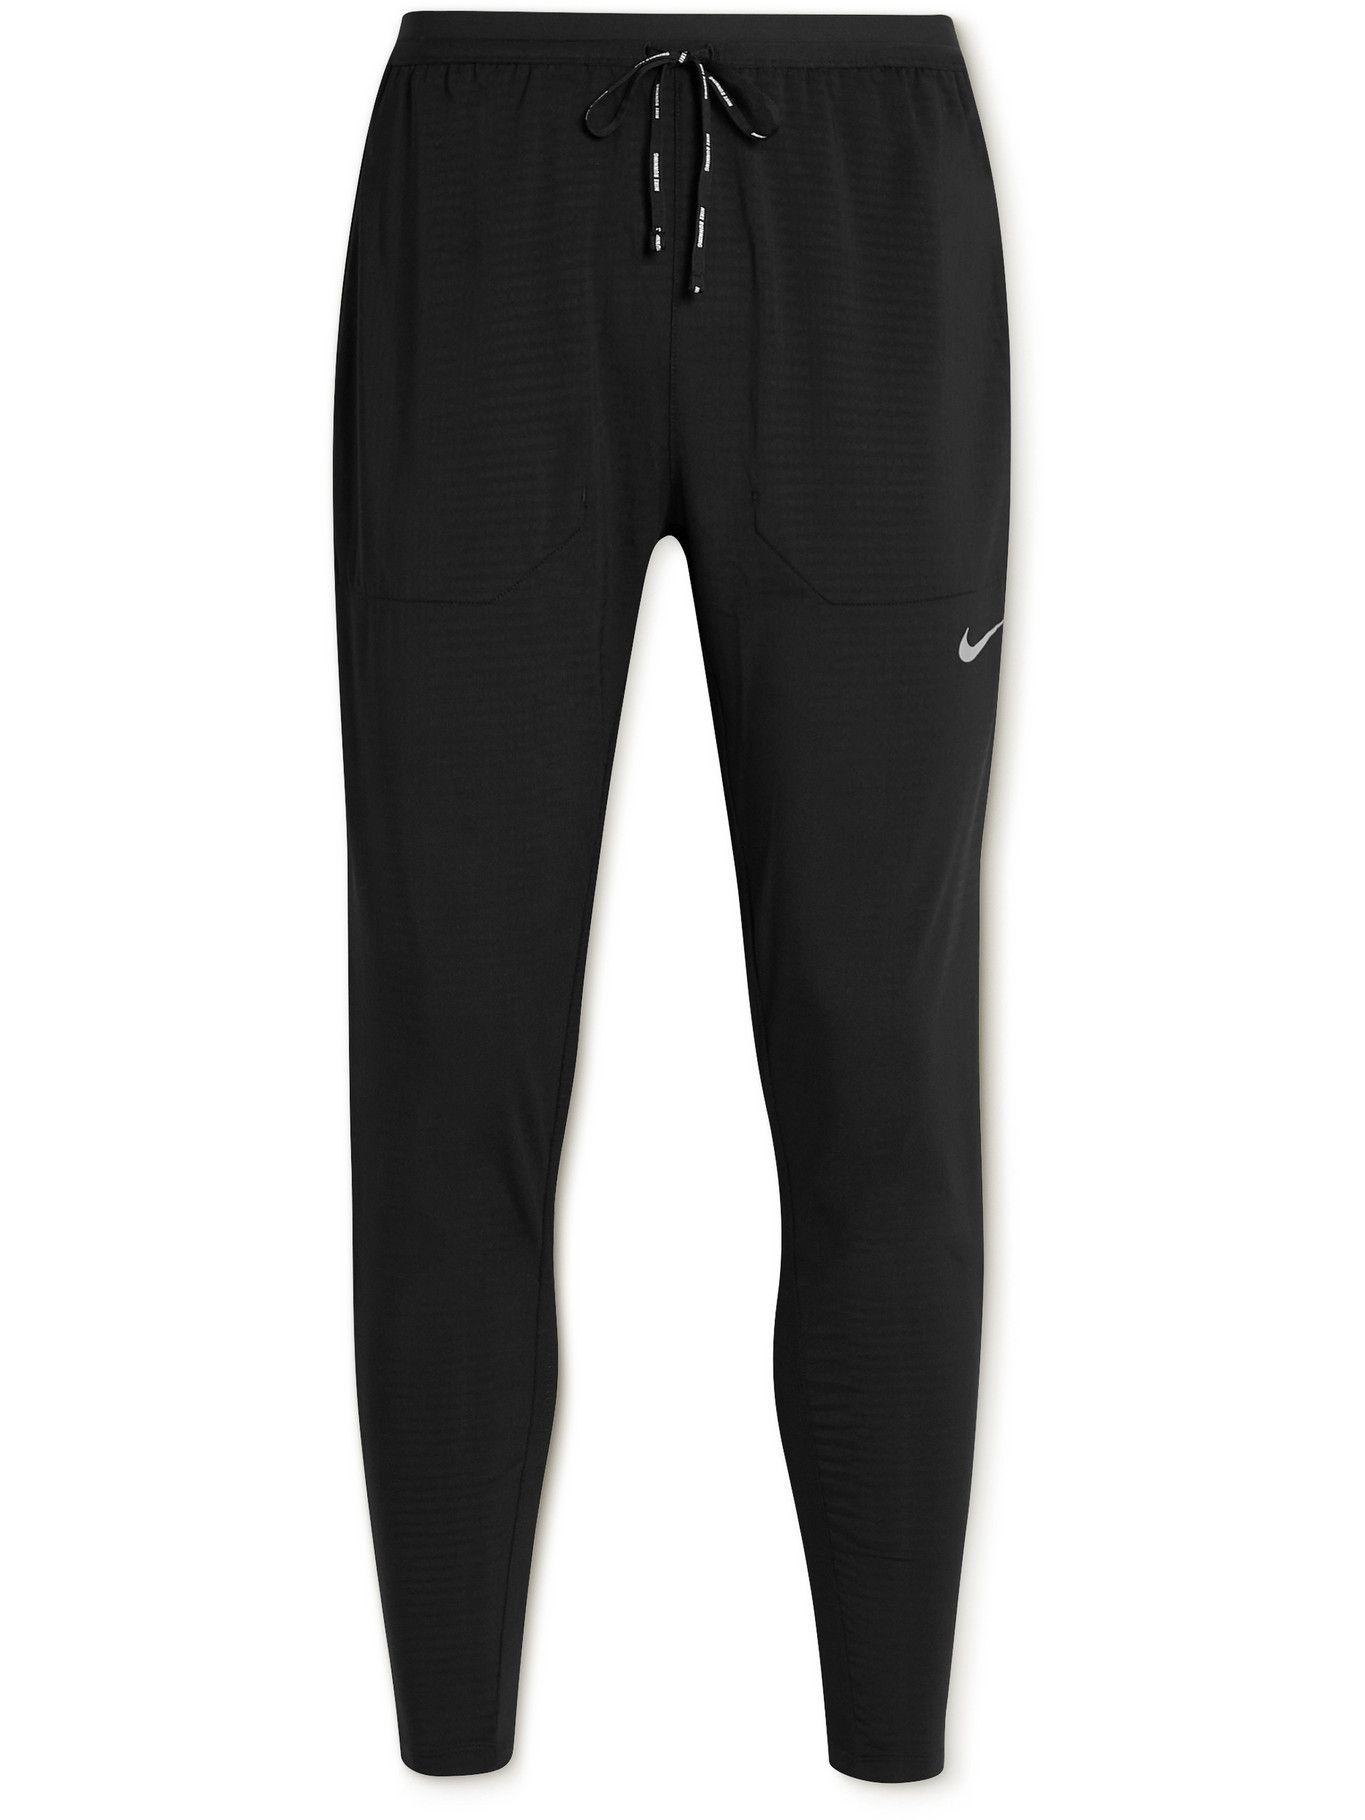 NIKE RUNNING - Phenom Elite Slim-Fit Tapered Recycled Dri-FIT Track Pants - Black